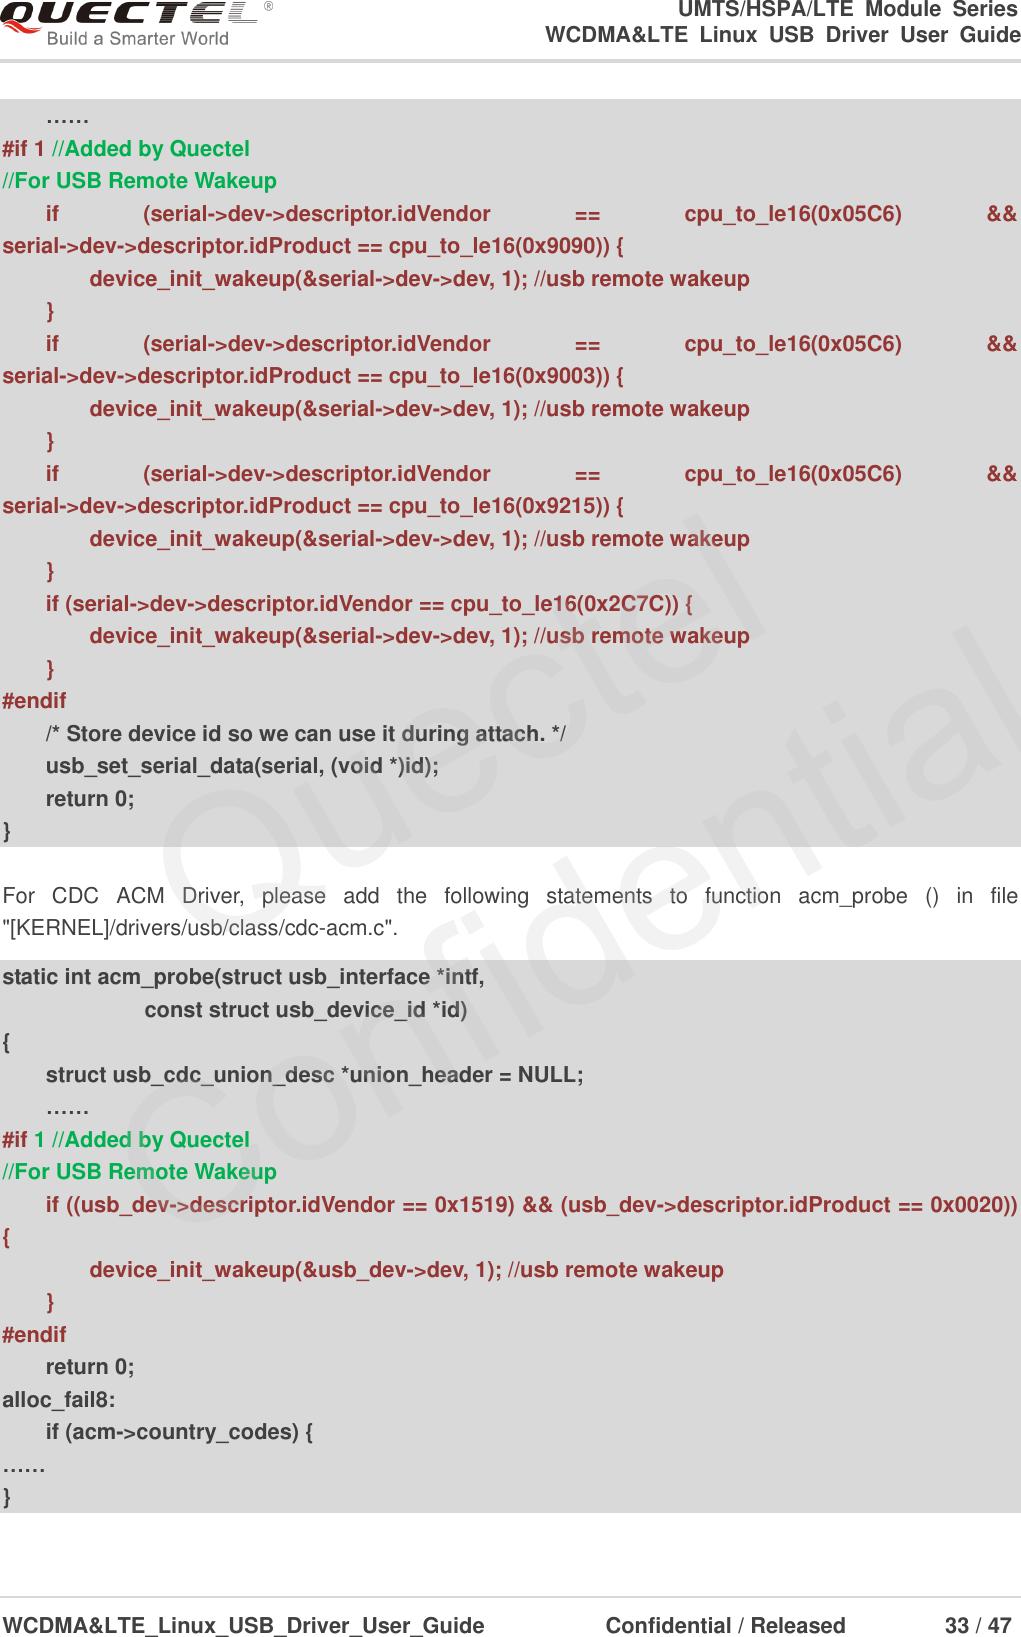 Quectel WCDMA<E Linux USB Driver User Guide V1 7